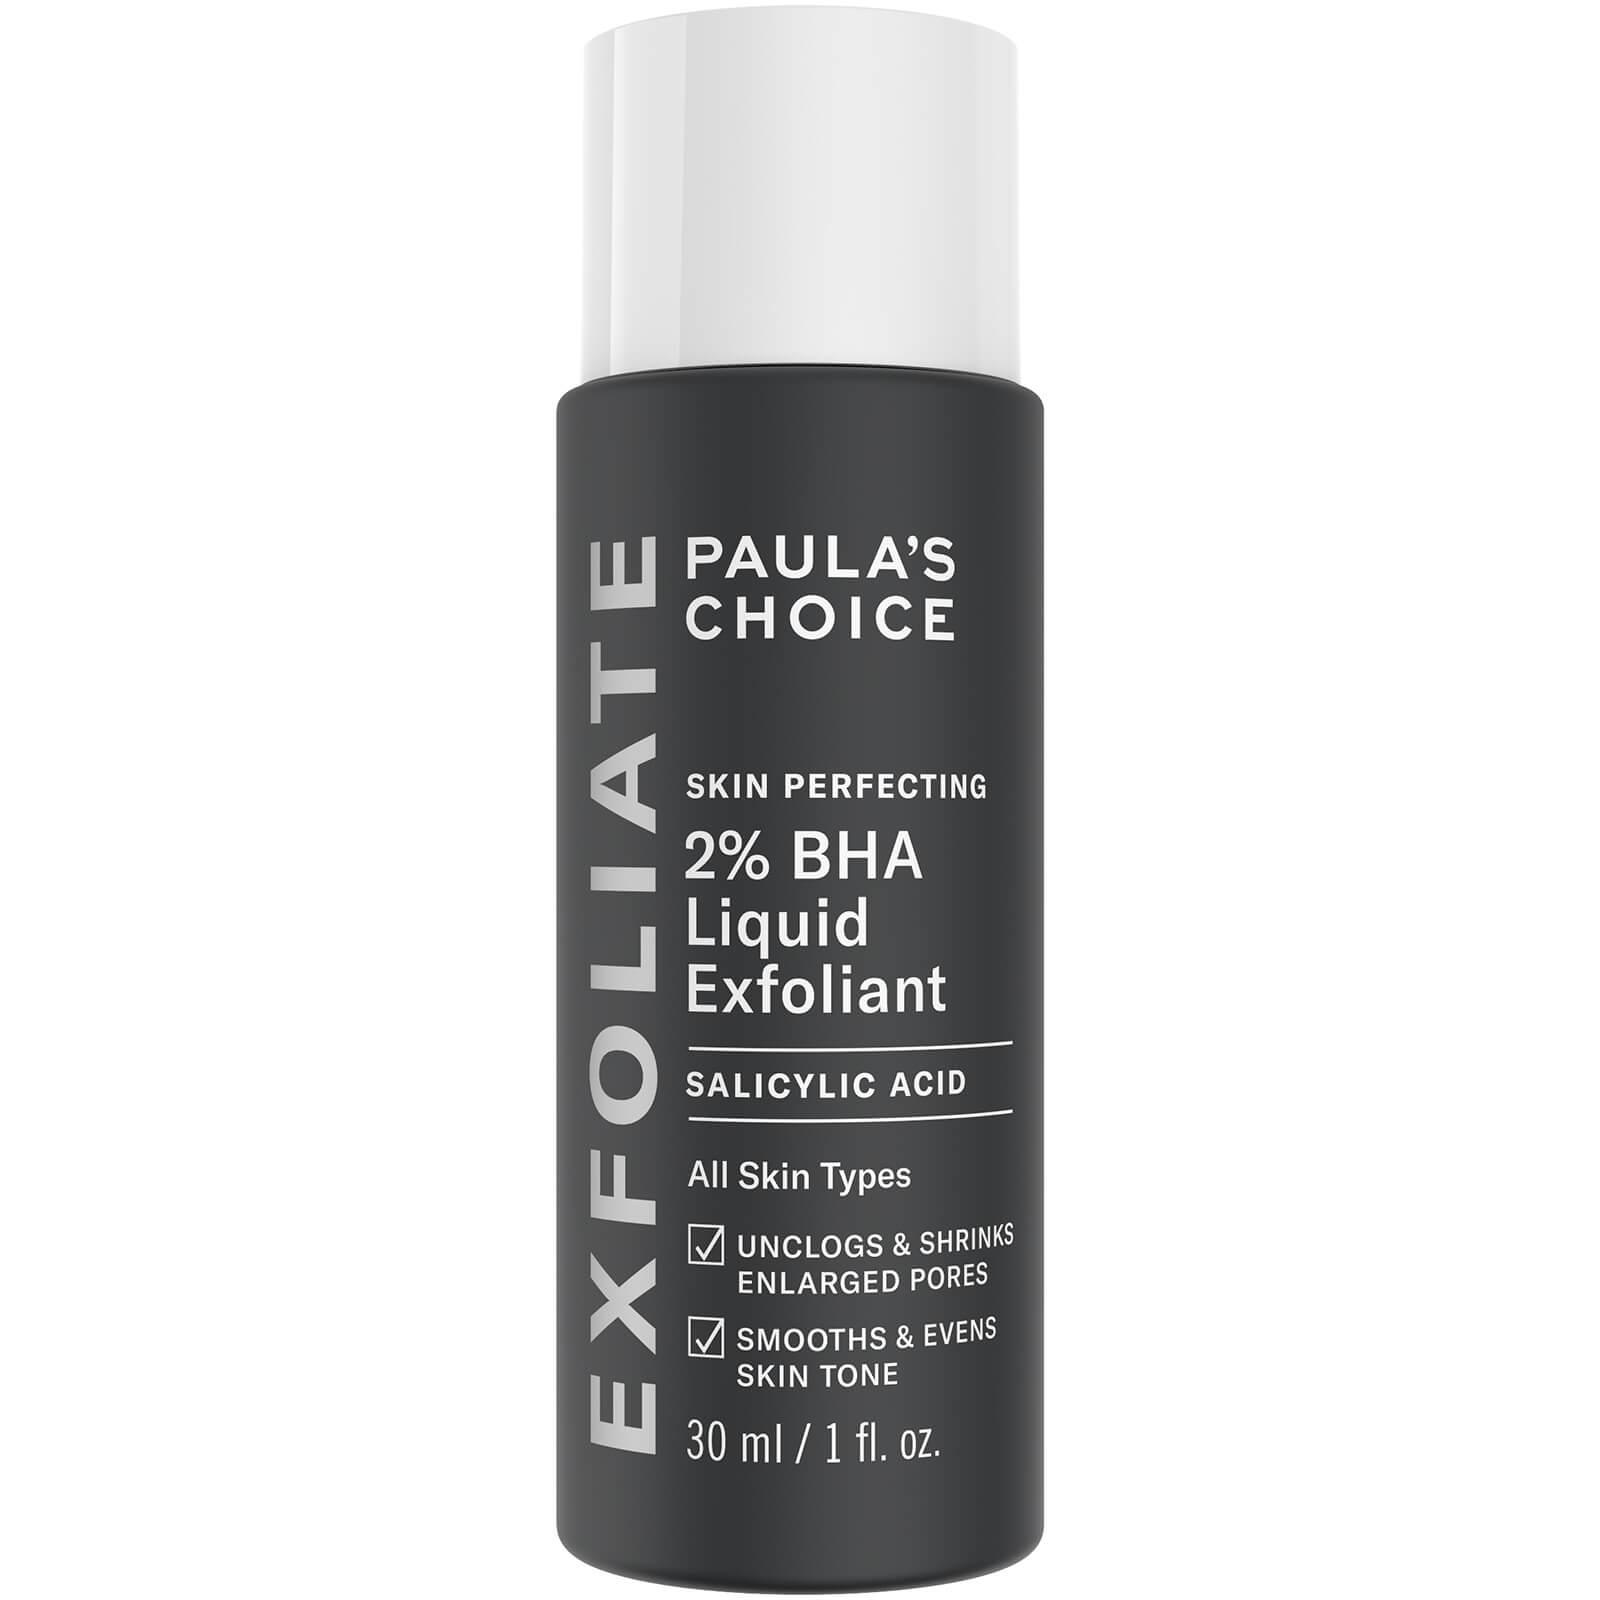 Paula s Choice Exfoliante líquido 2 % BHA Skin Perfecting de Paula s Choice - tamaño de prueba (30 ml)